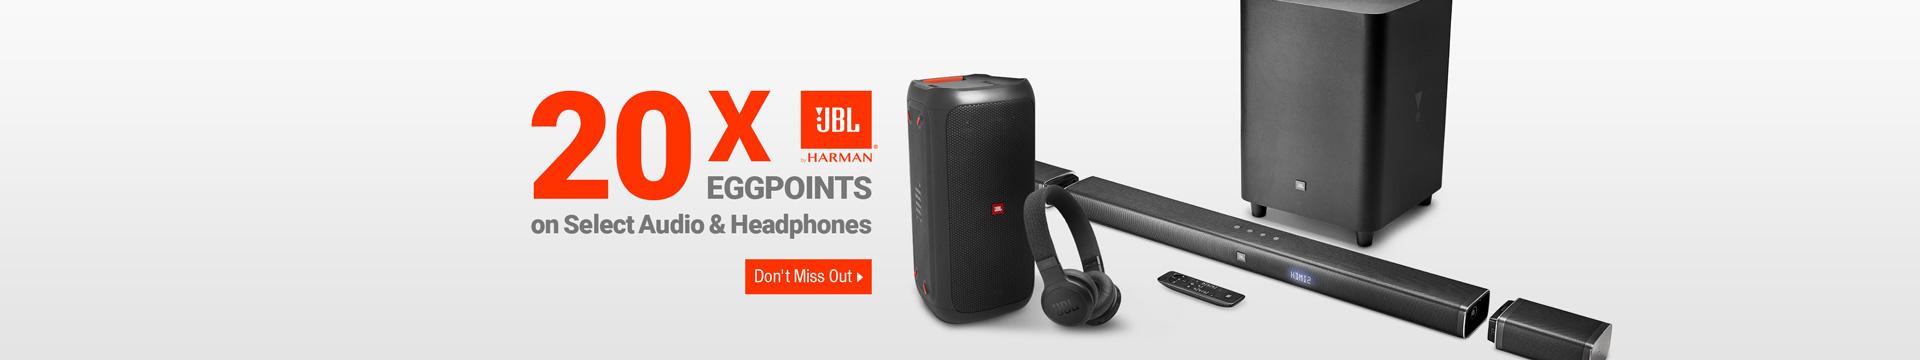 20x EGGPOINTS on Select Audio & Headphones